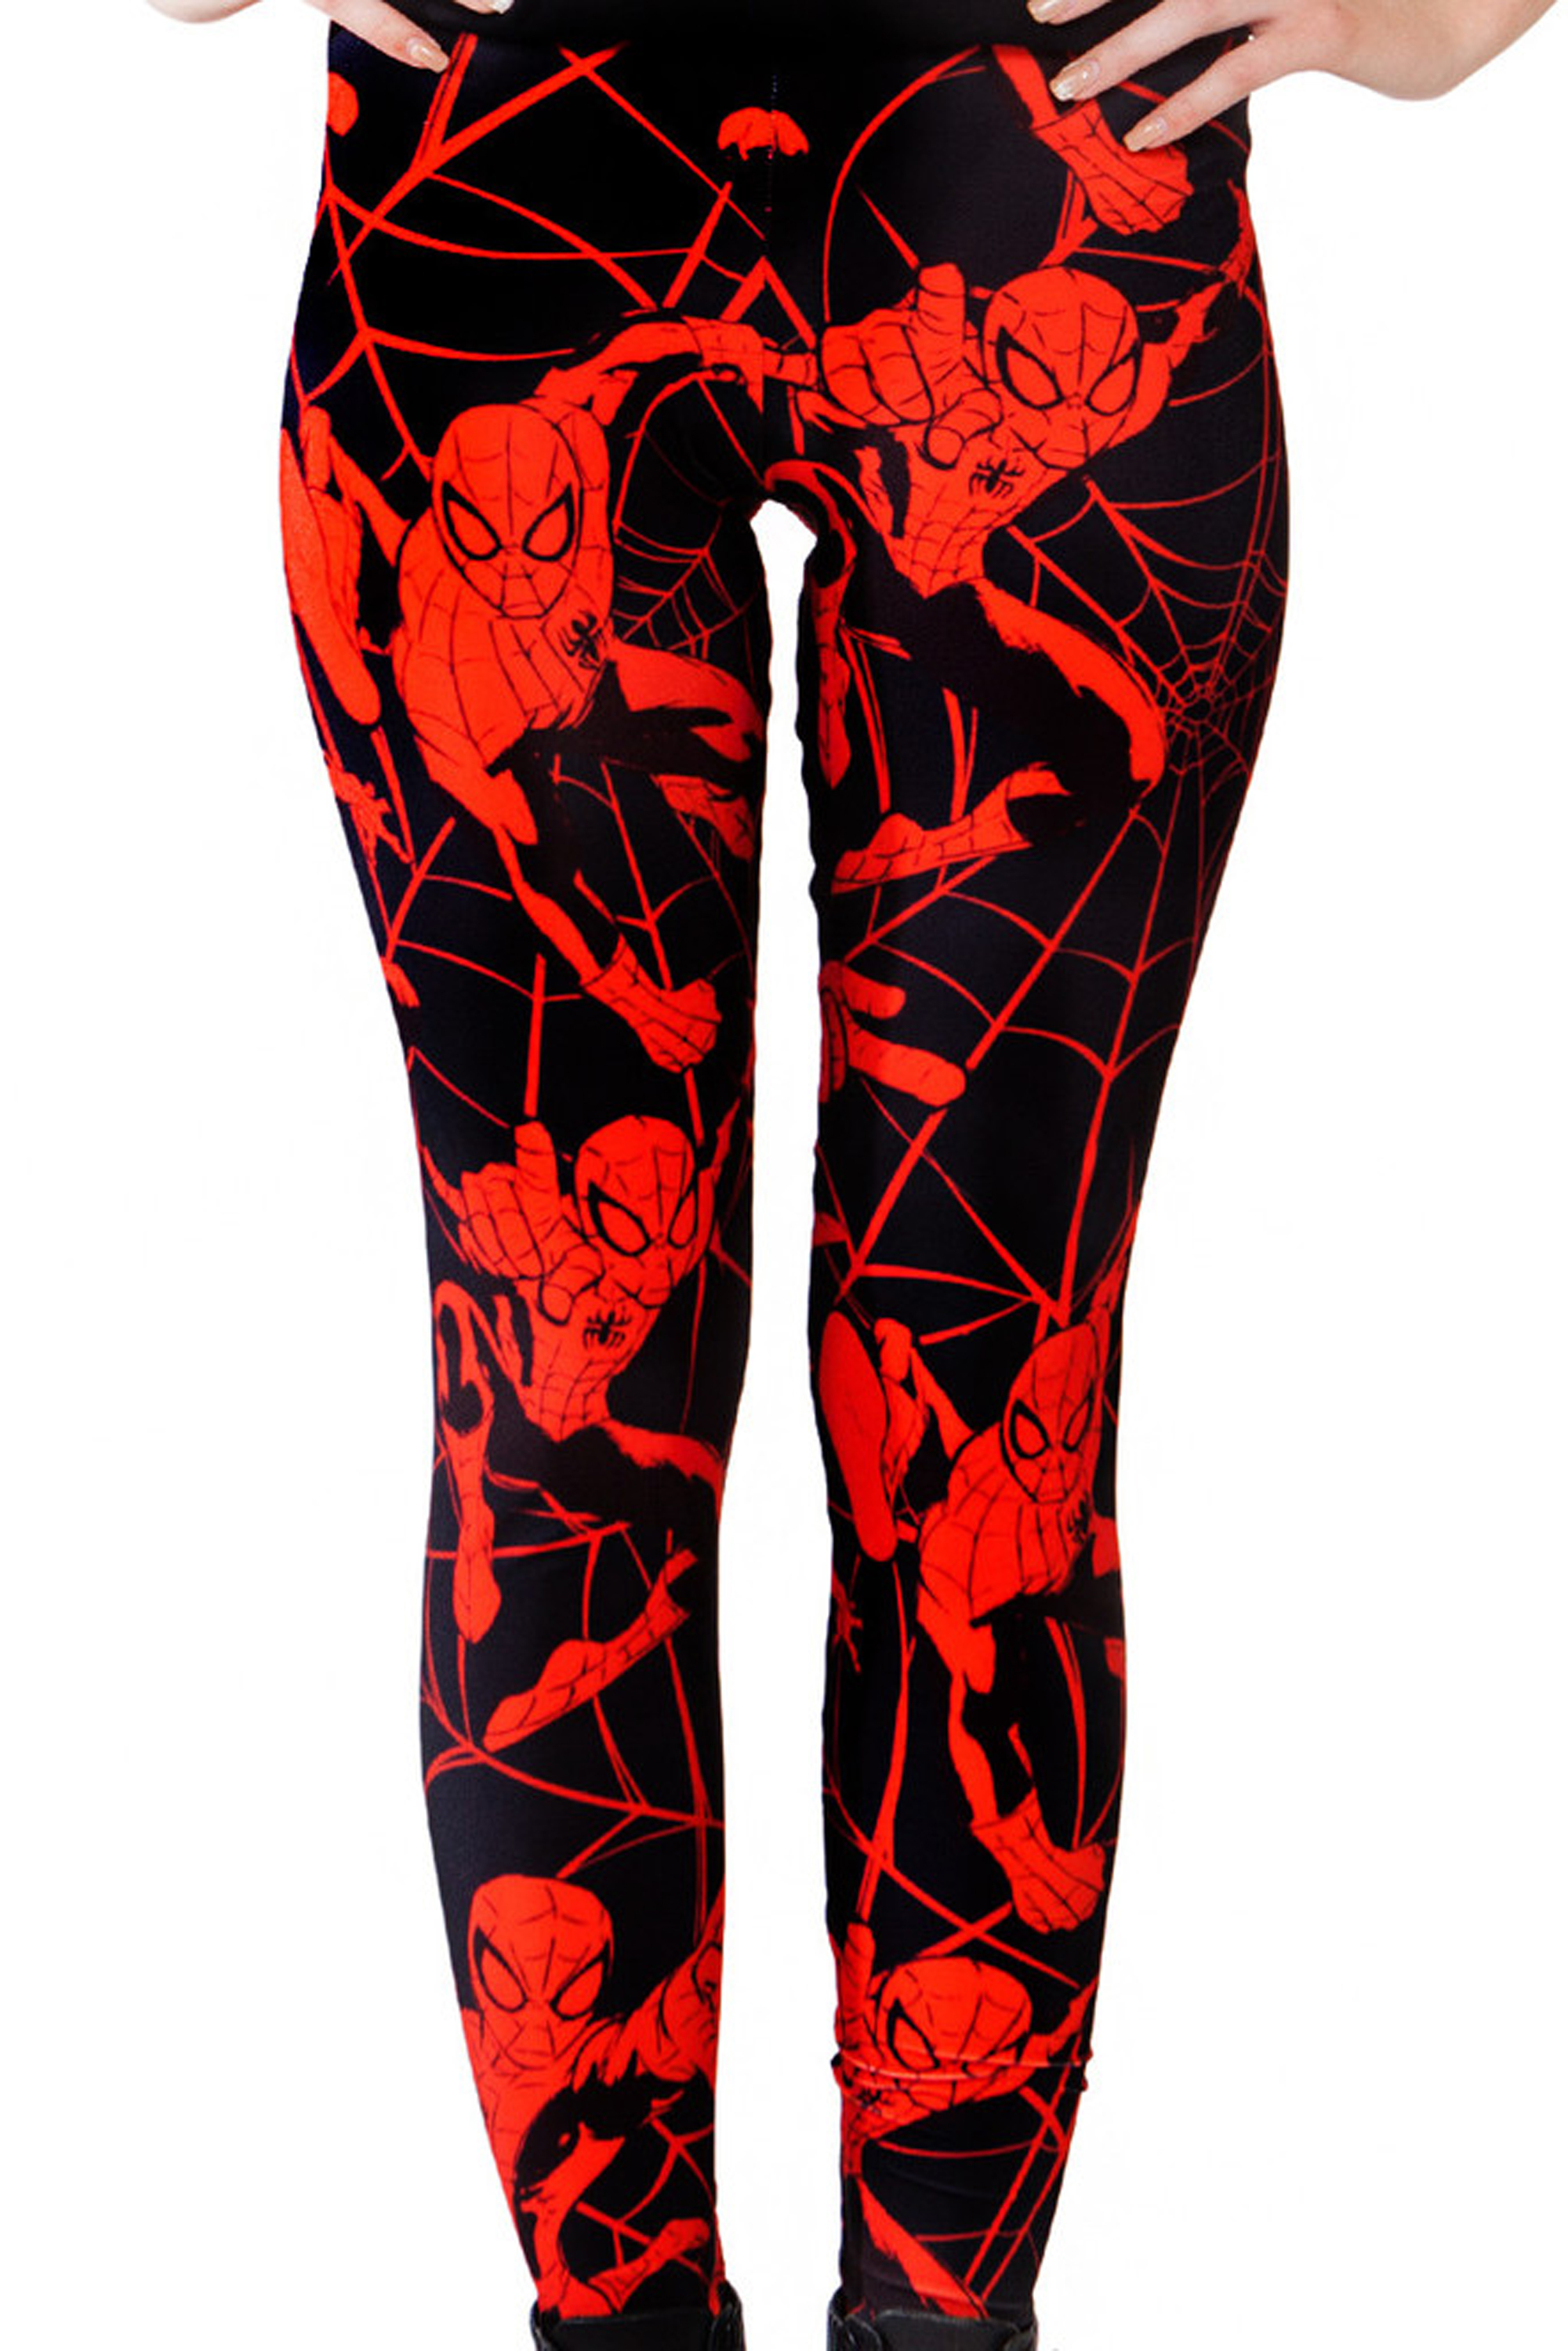 Dark Red Spiderman Print Leggings Women Sexy Slim Fitness Leggings High Waist Elastic Casual Leggings Plus Size Leggins Mujer leggings